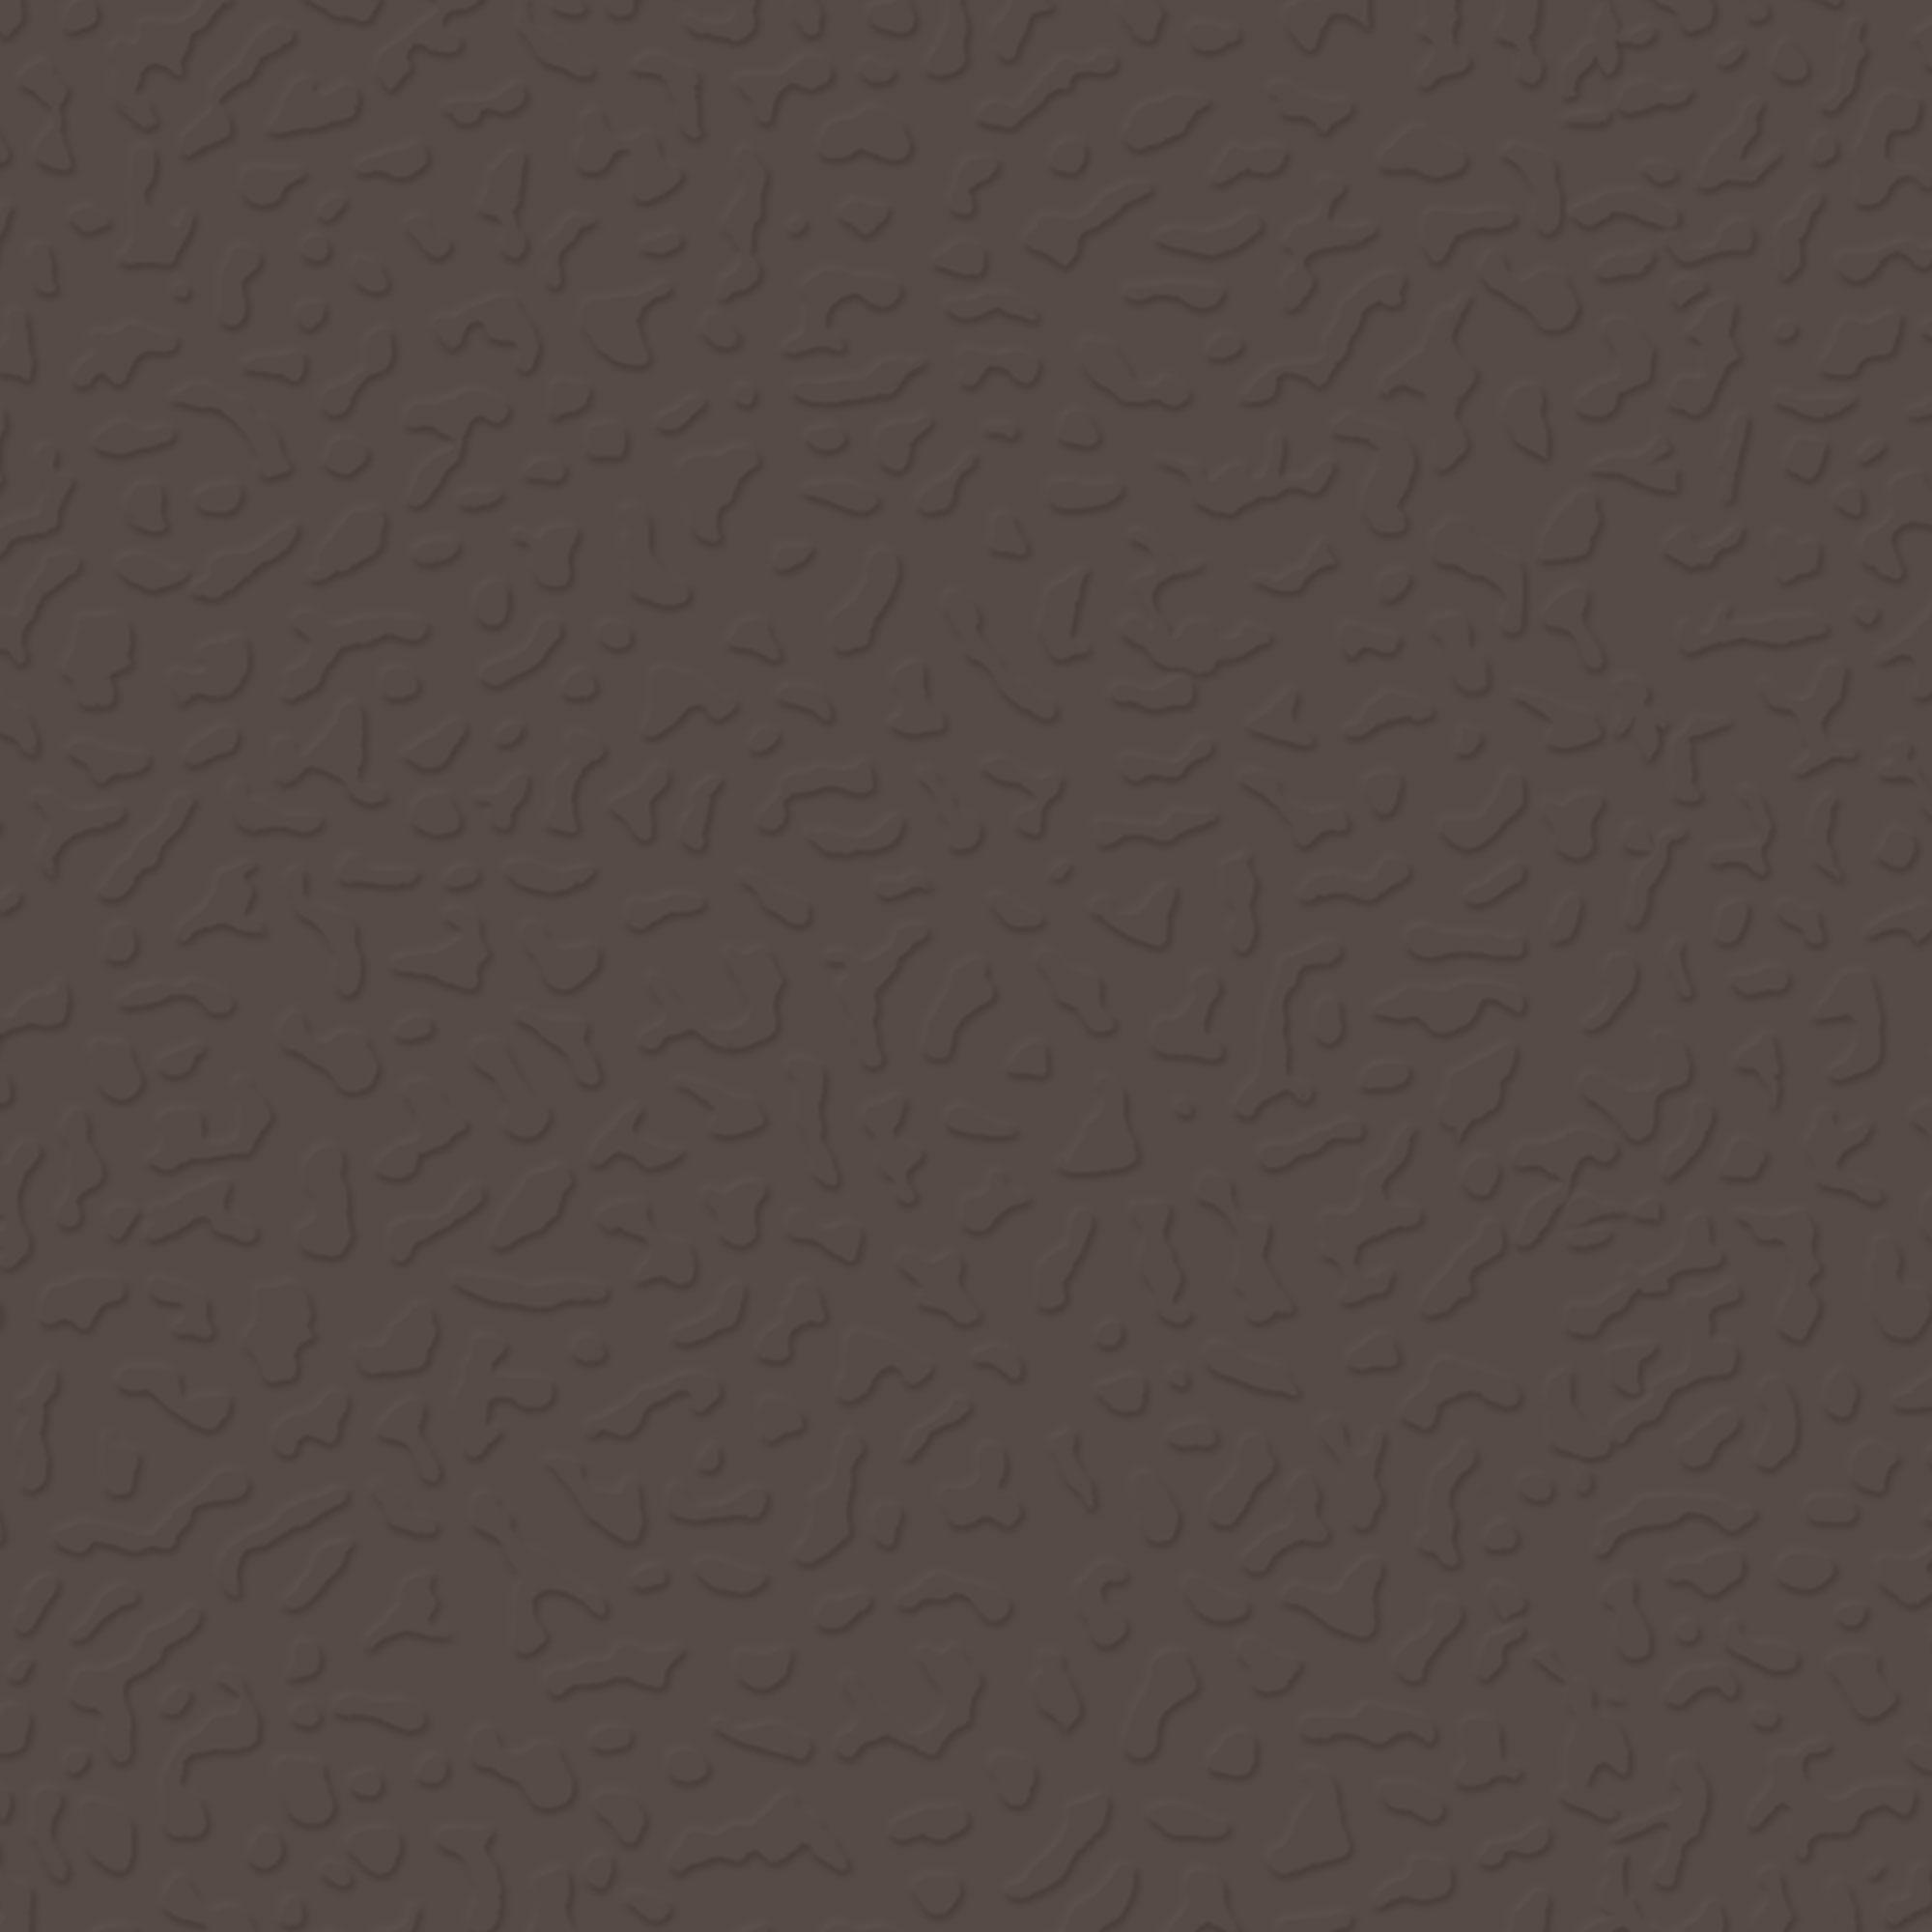 Roppe Rubber Tile 900 - Textured Design (993) Light Brown Rubber Flooring